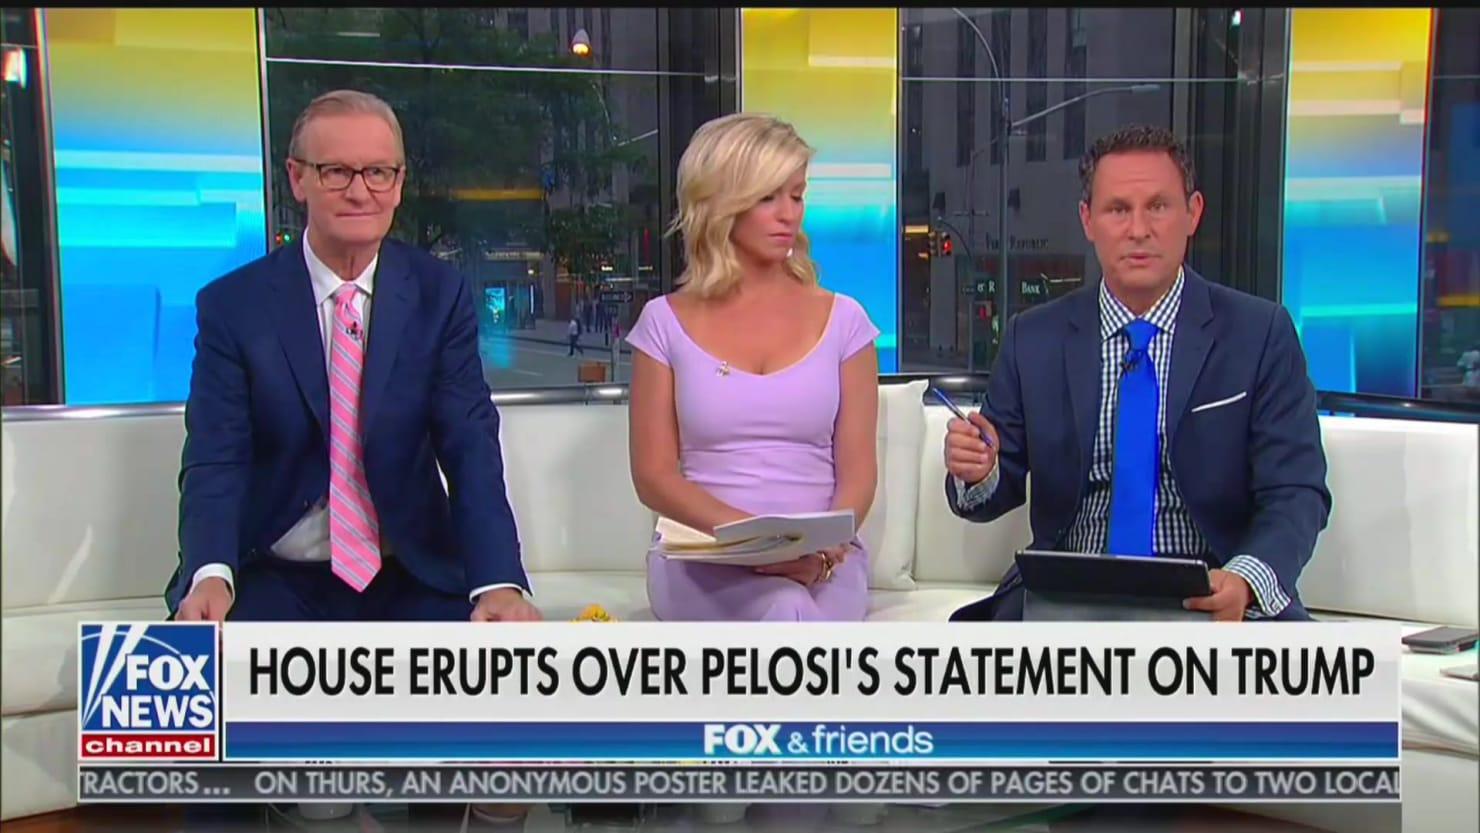 Fox News' Brian Kilmeade Complains That Calling Trump a Racist 'Is Personally Offensive'